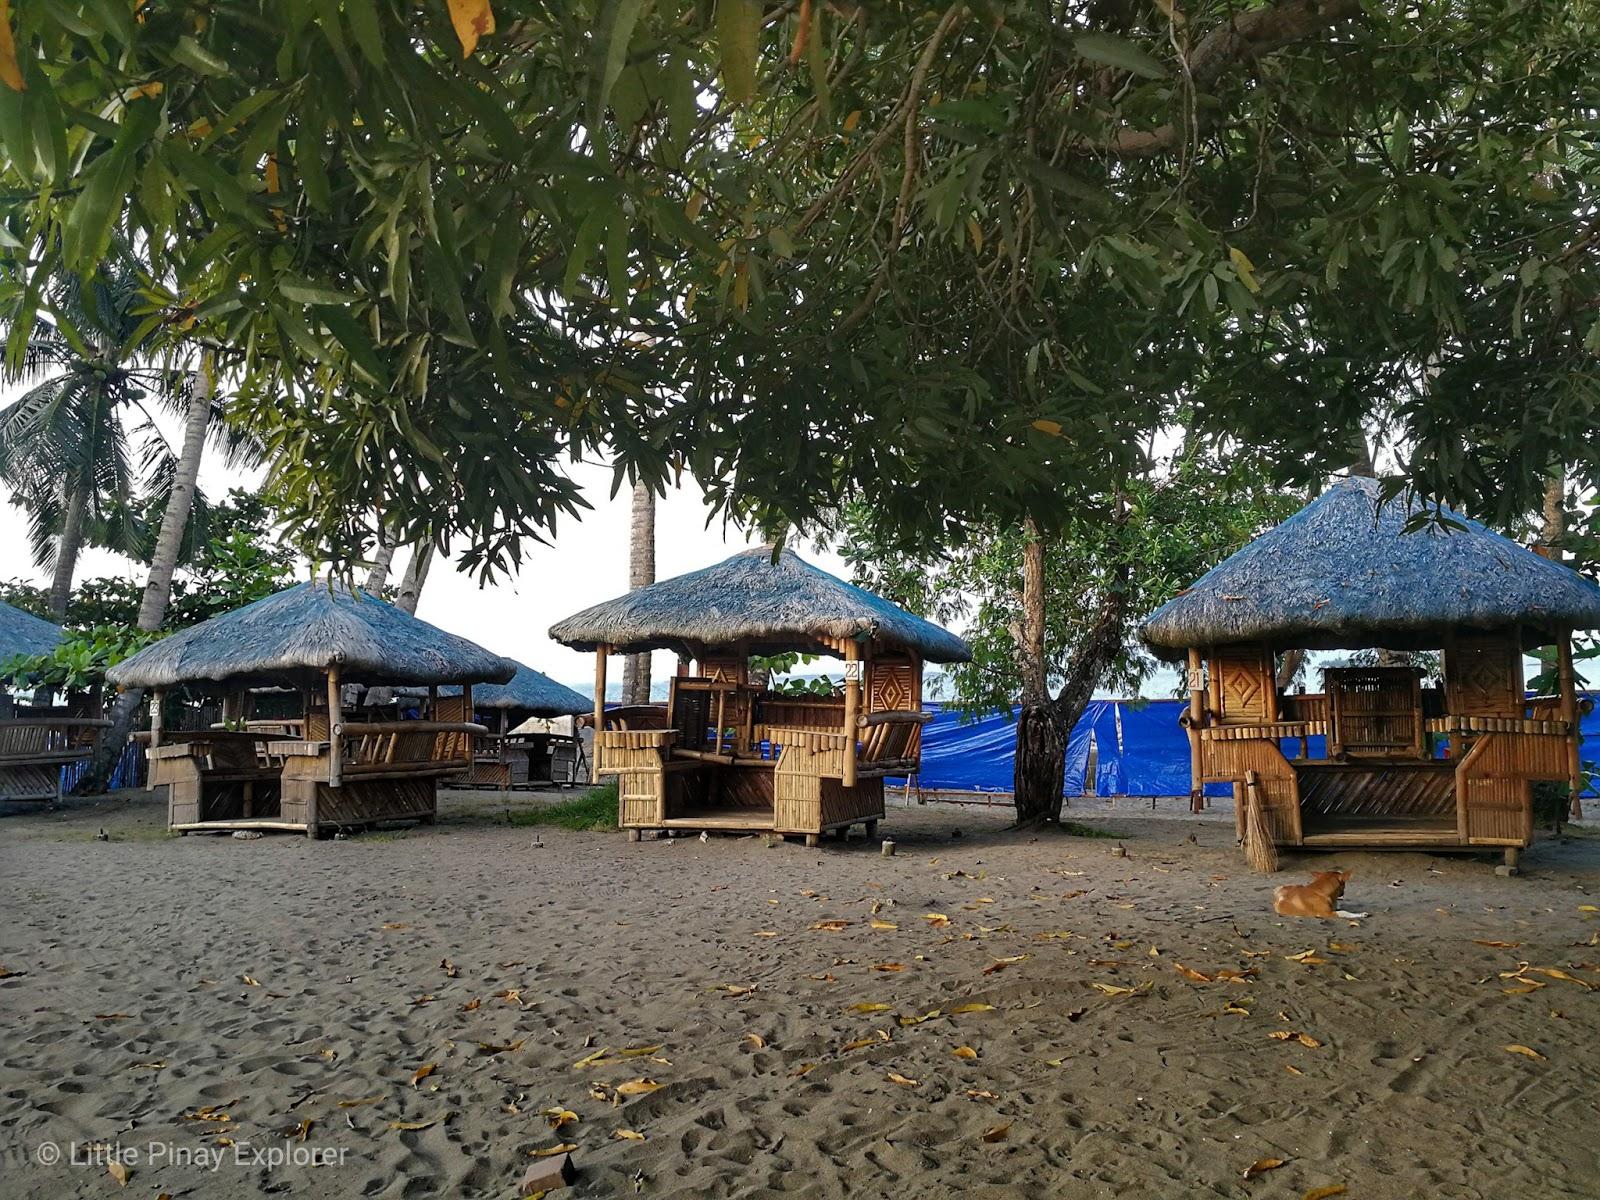 Little Pinay Explorer: Patio Victoria, Tacloban City